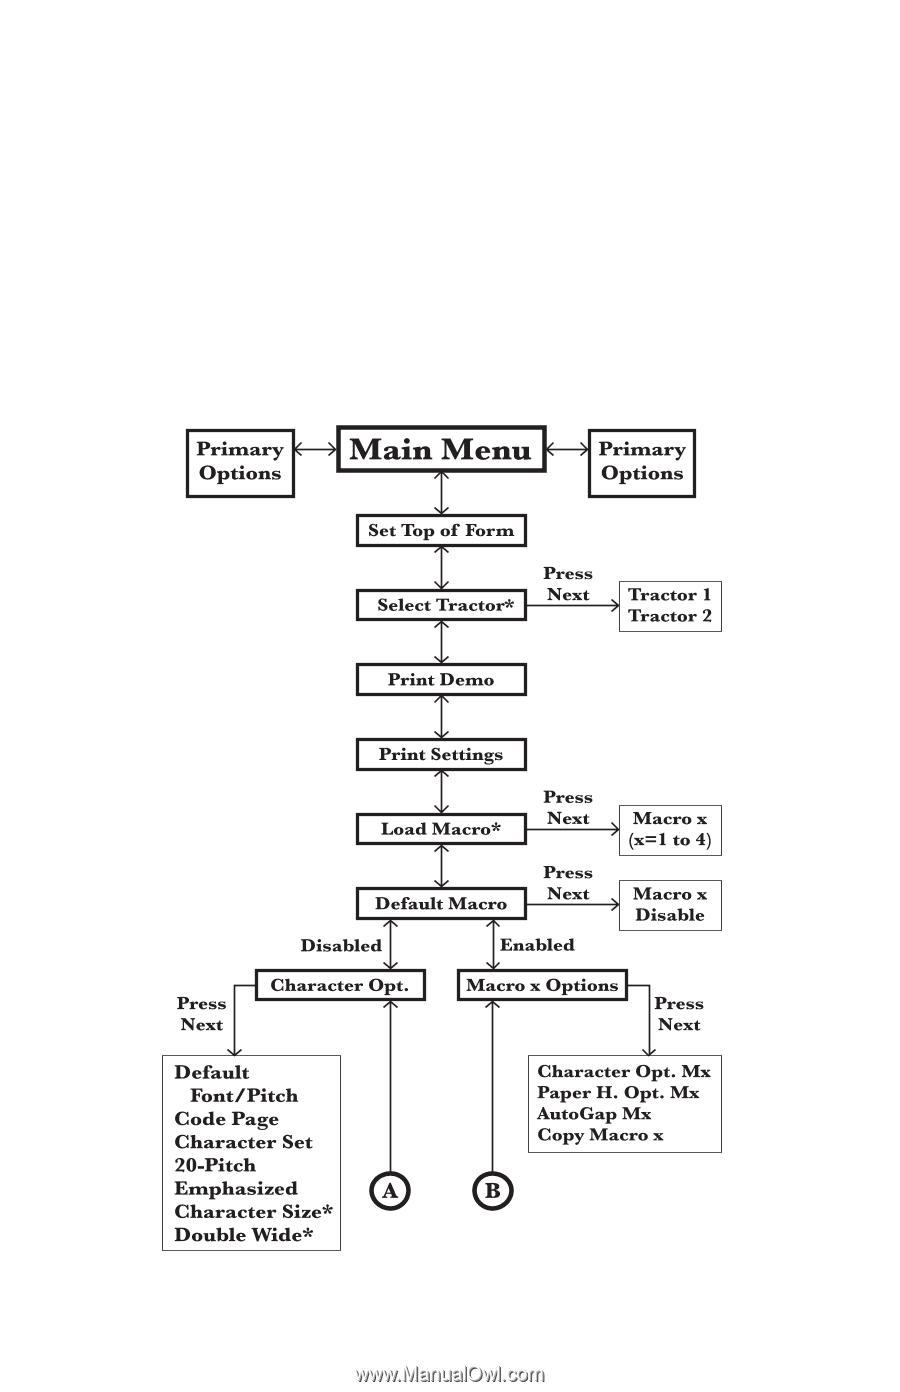 1-8. Service Manual. 4227-300